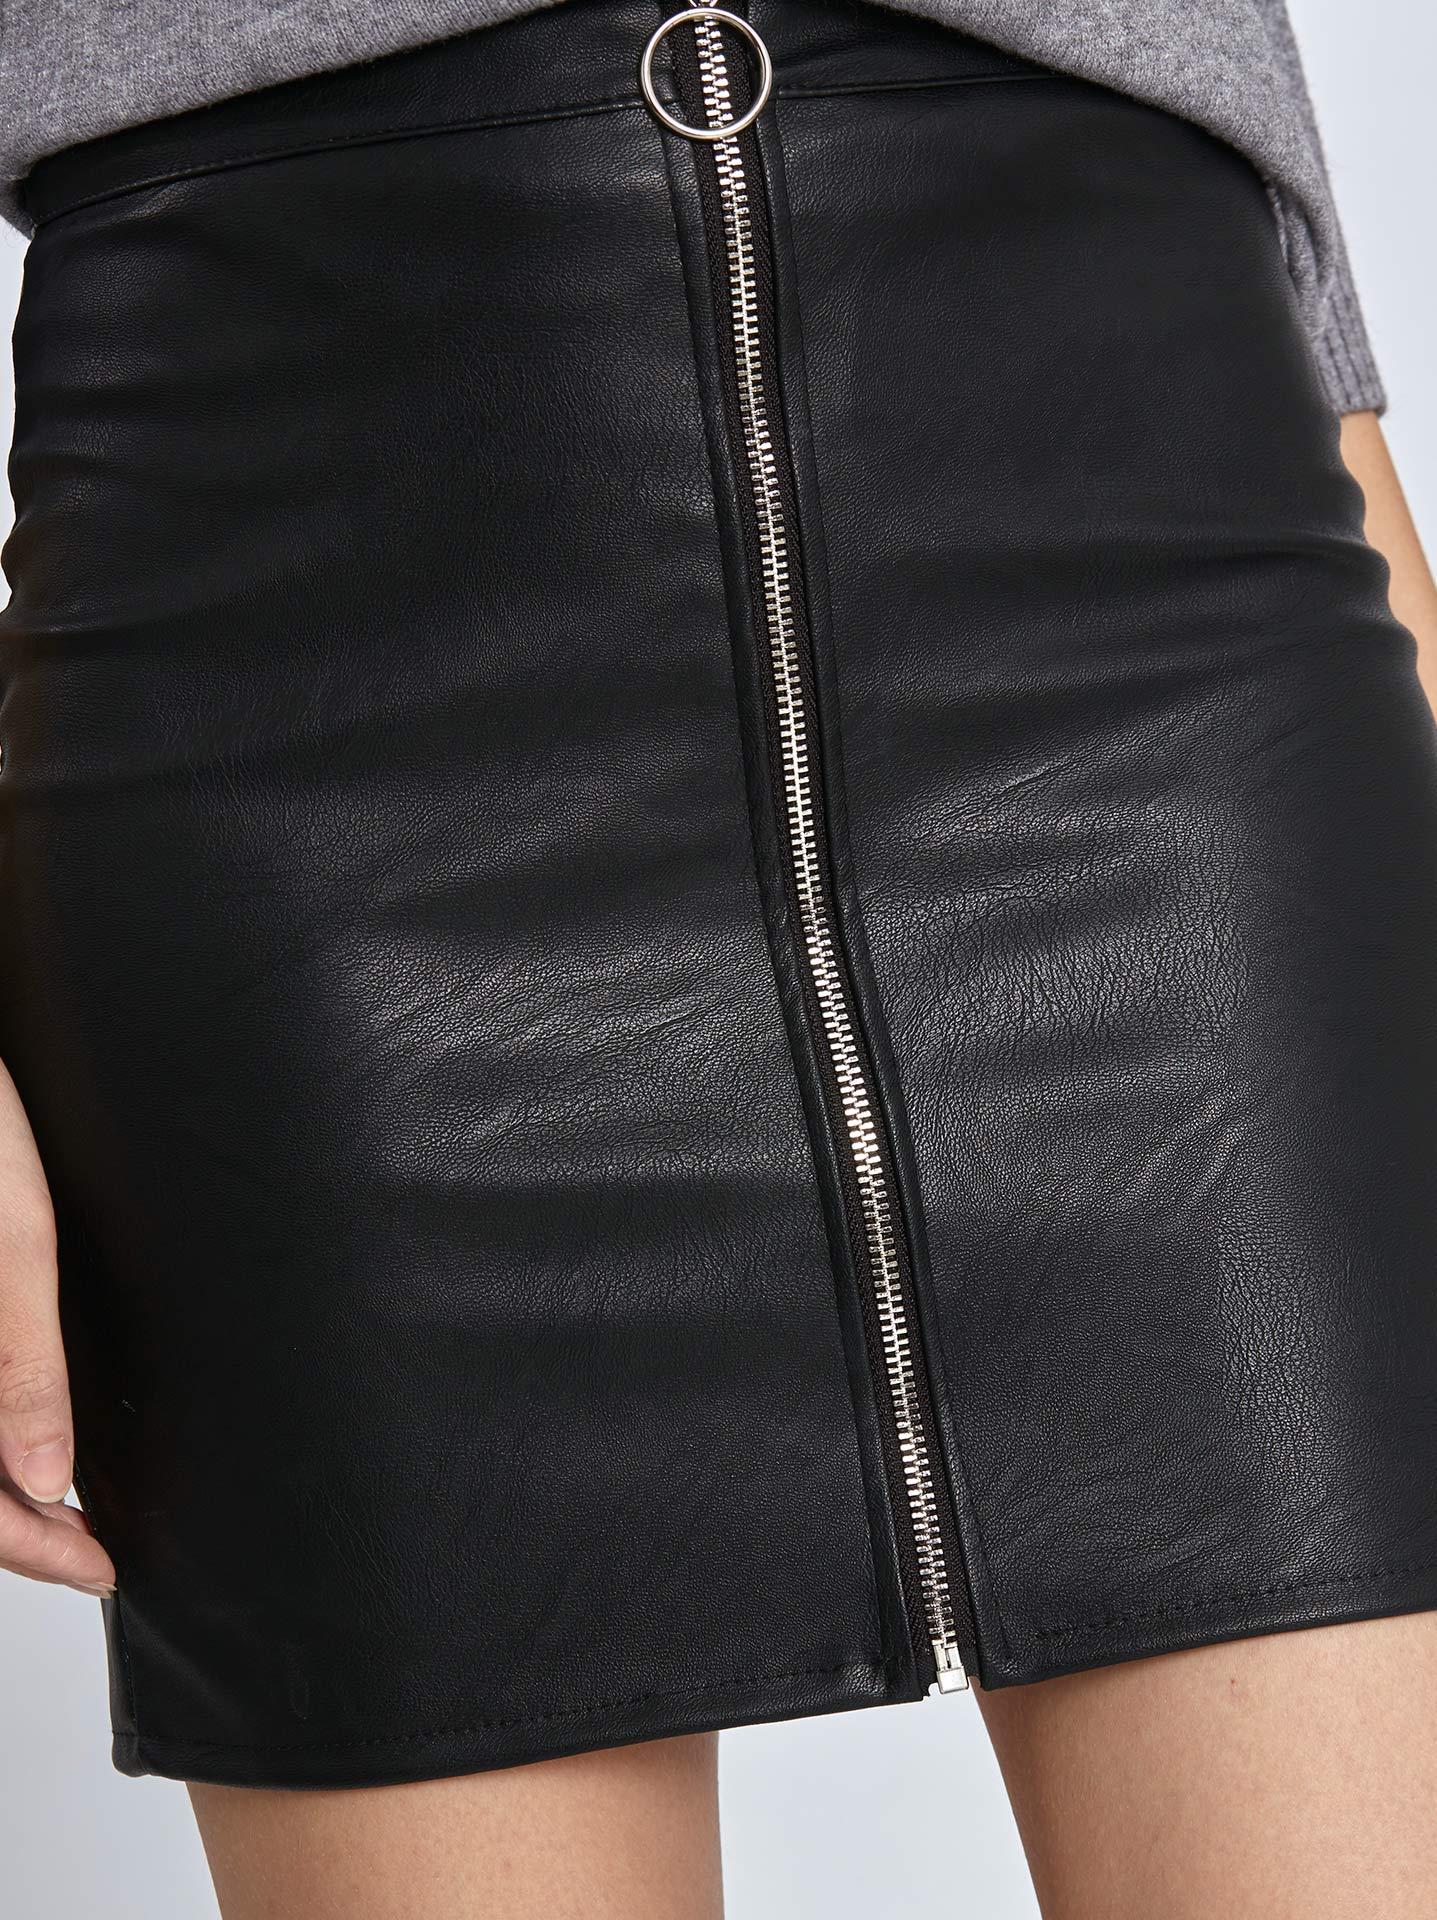 208005e137f Mini φούστα δερματίνη σε μαυρο, 7,95€ | Celestino